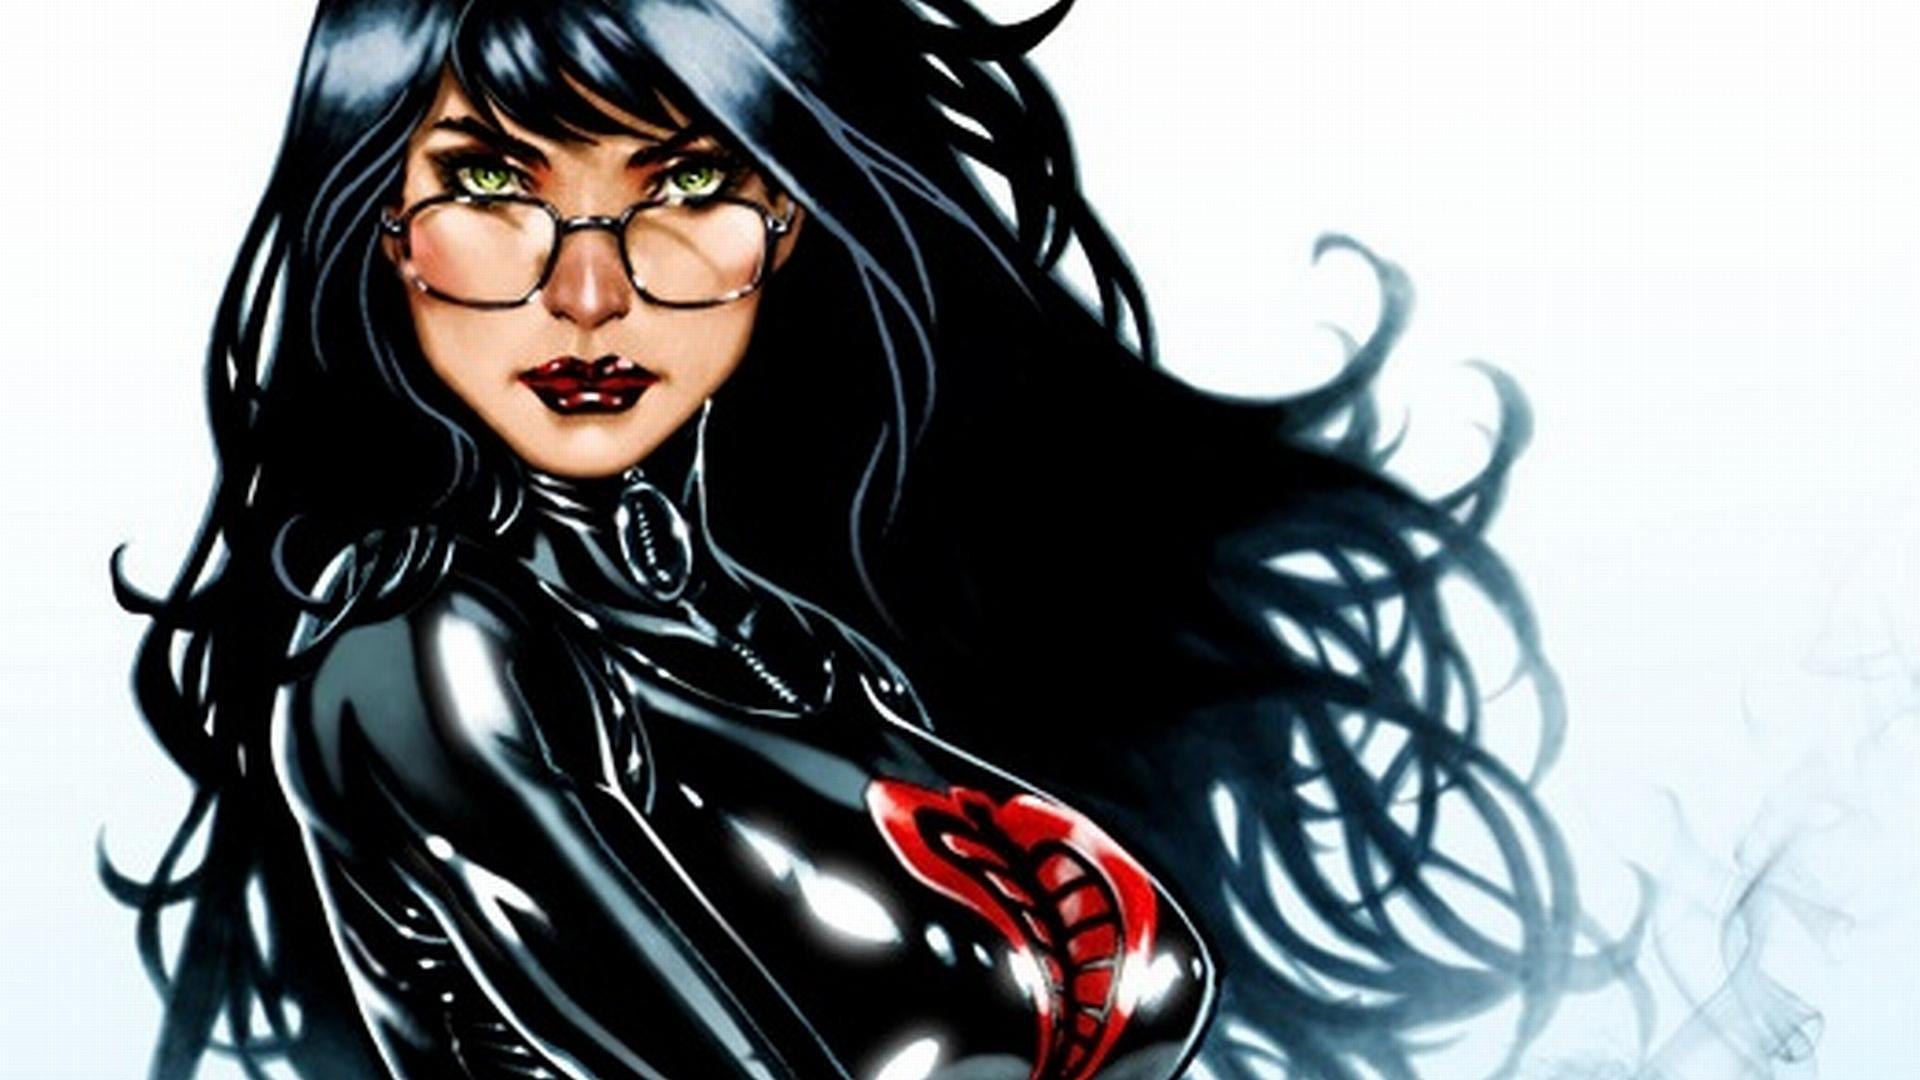 Baroness Comics wallpapers HD quality